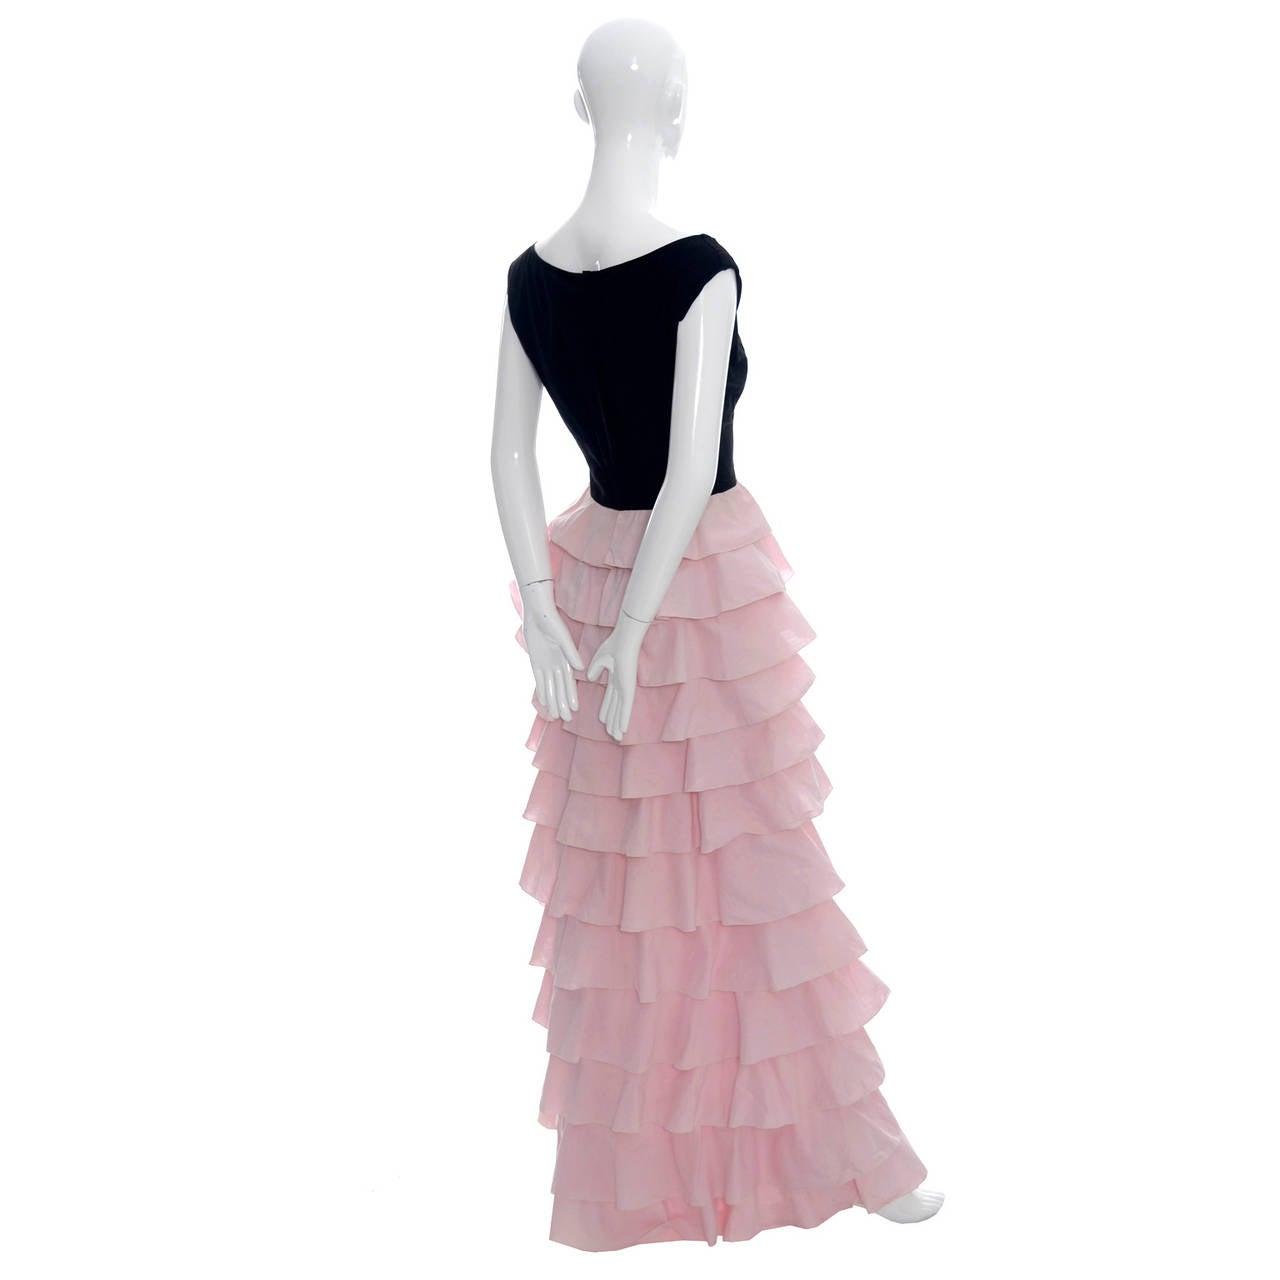 1940s Vintage Gilbert Adrian Original Dress Pink Ruffles Rare Designer Gown For Sale 1